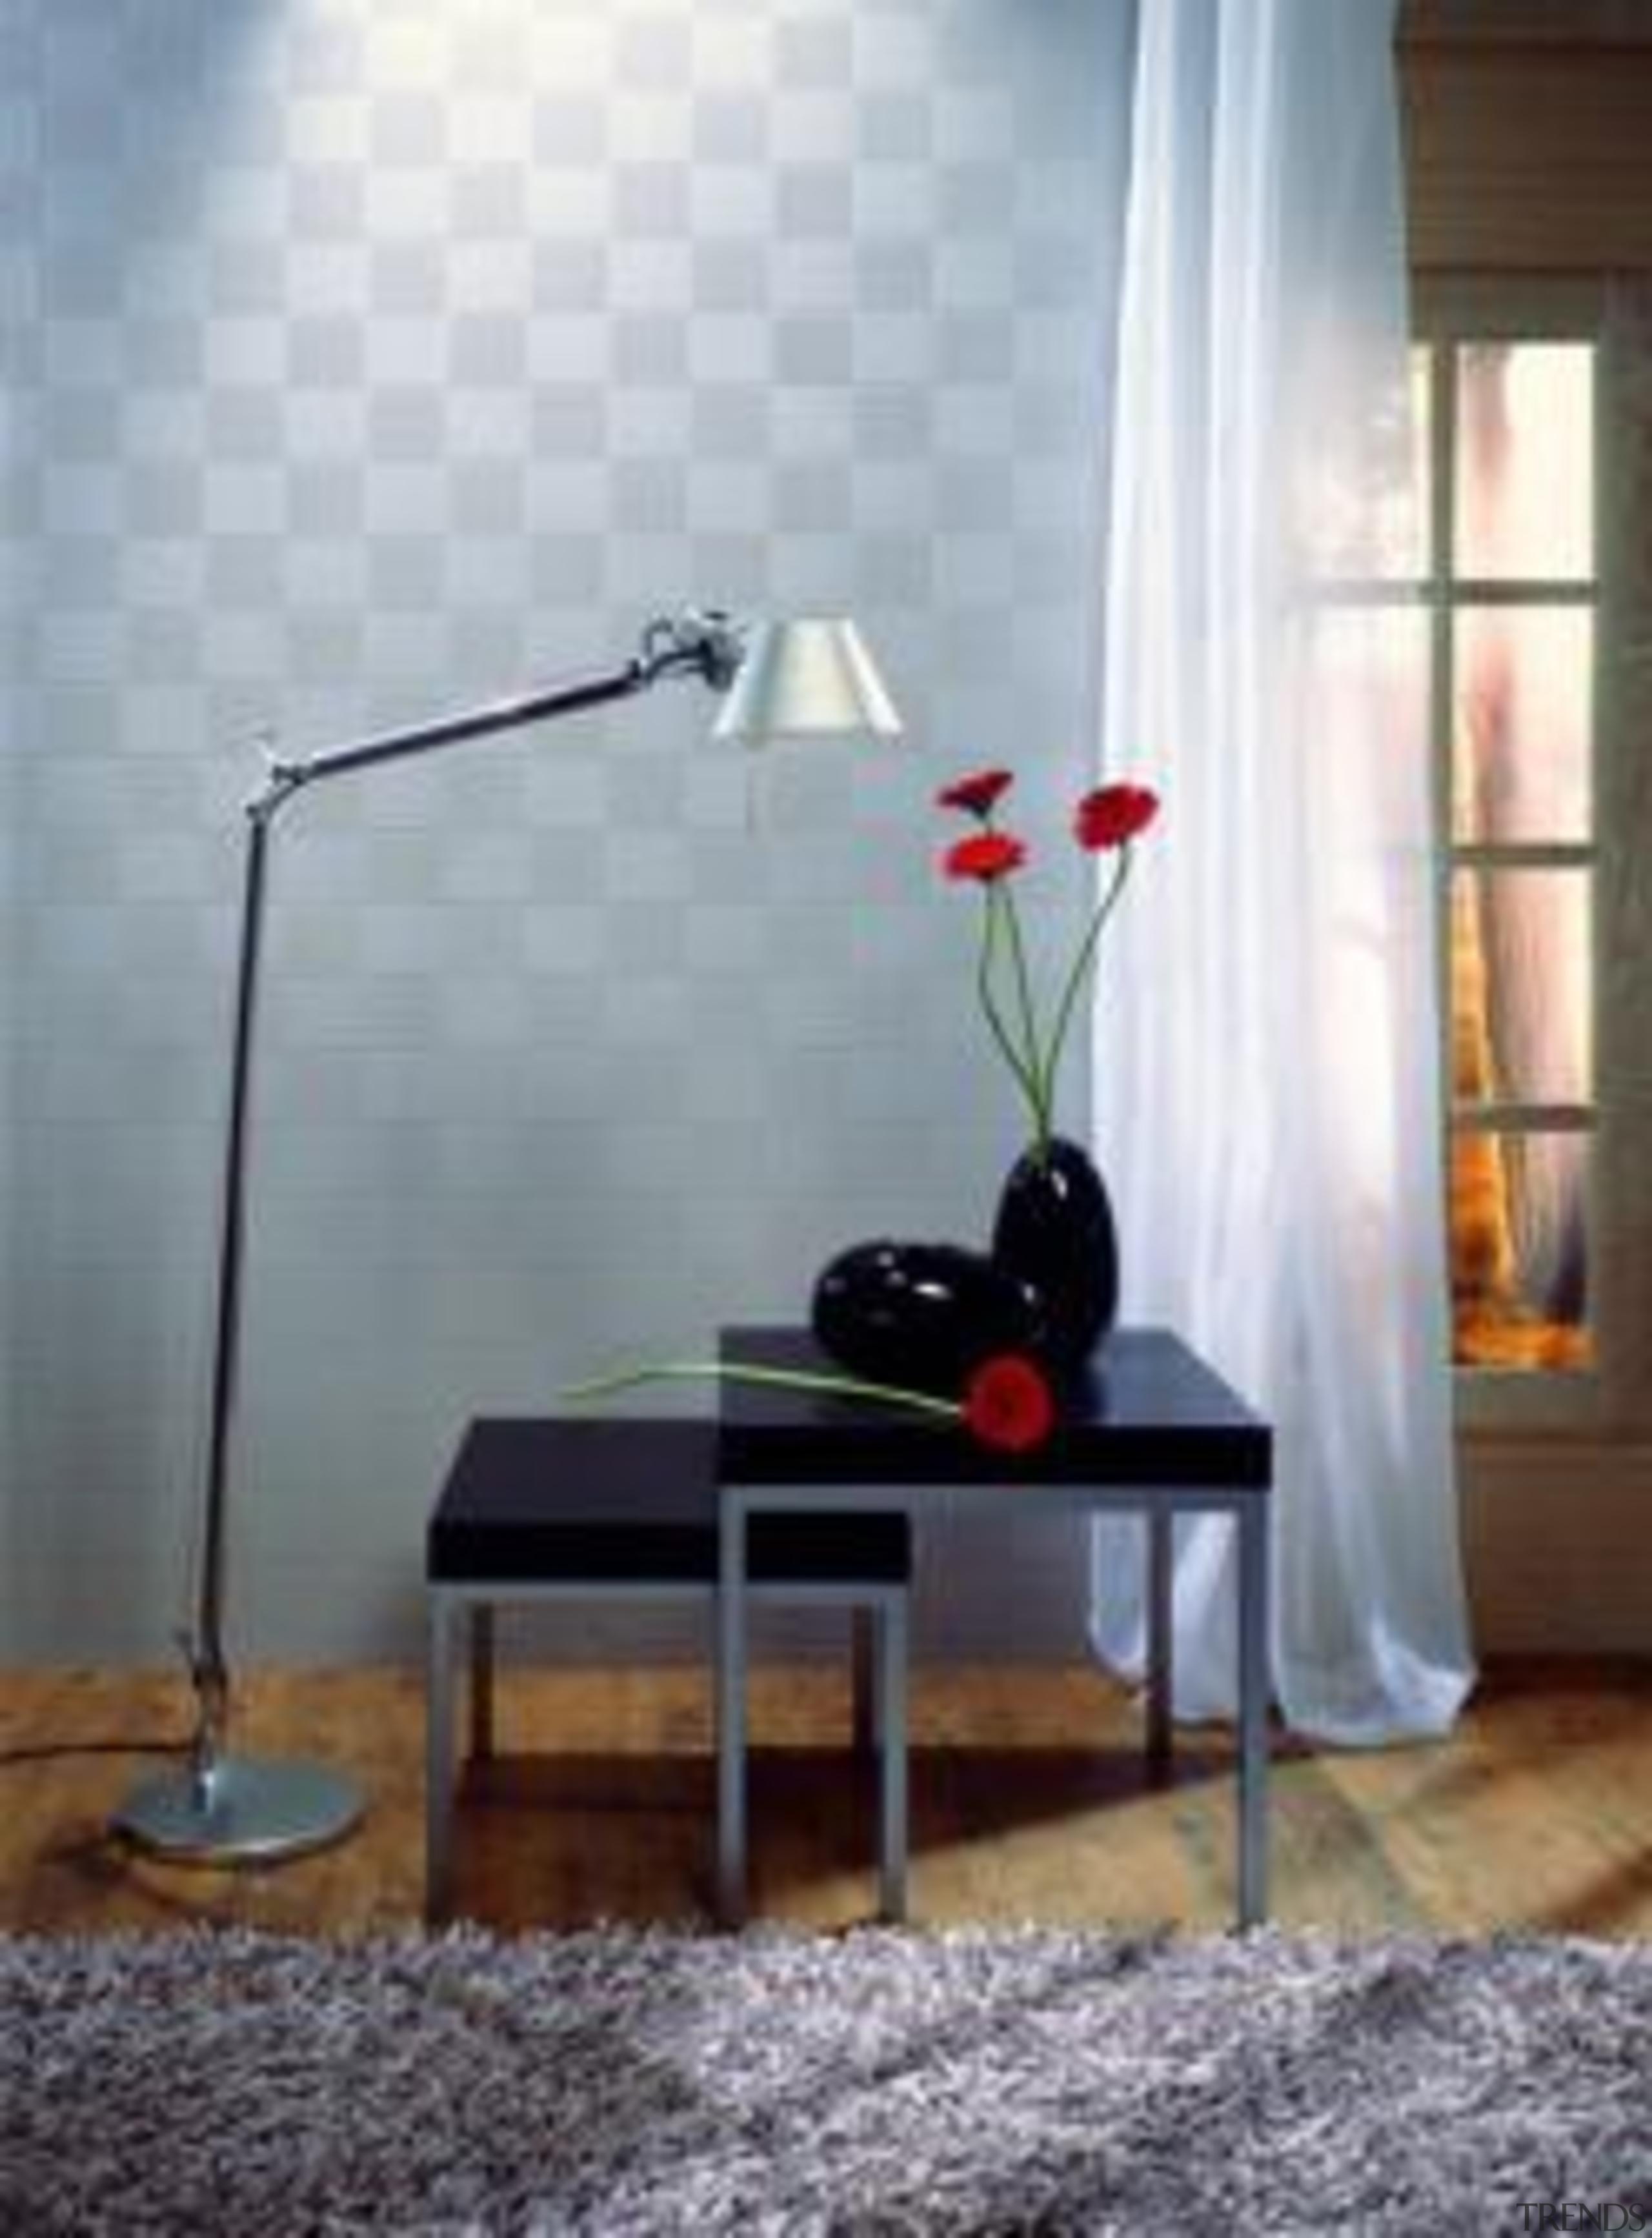 Wallton Painton Range - Wallton Painton Range - floor, flooring, furniture, interior design, lamp, light fixture, lighting, lighting accessory, living room, product design, table, wall, window, gray